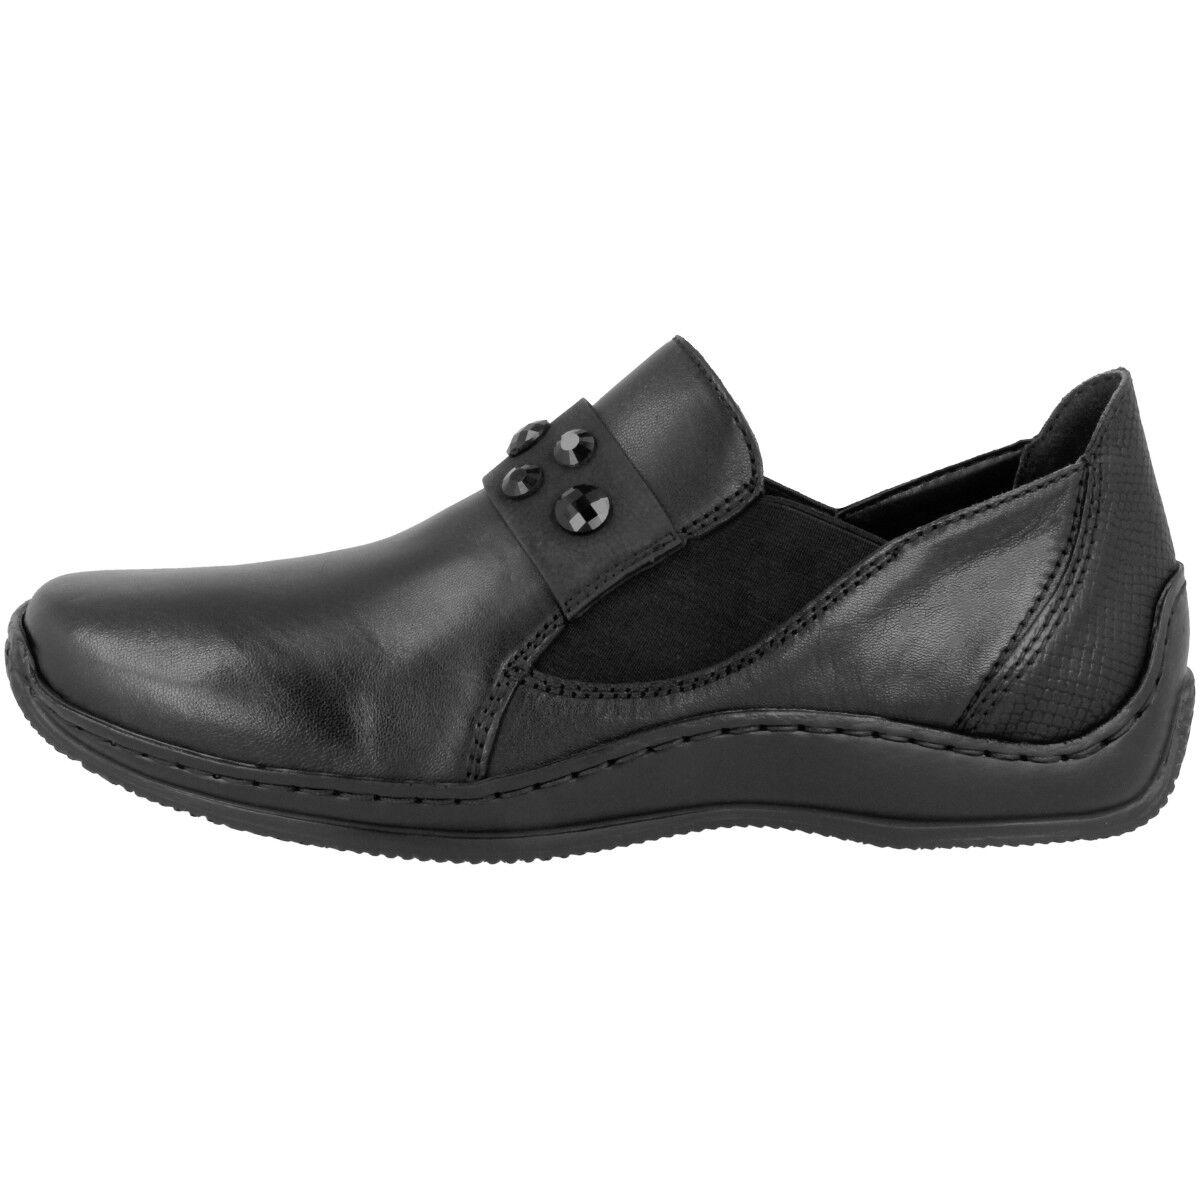 Rieker Antistress Lugano-Nablus-Snake Damens Schuhe Damen Antistress Rieker Slipper schwarz L1778-01 252b0a